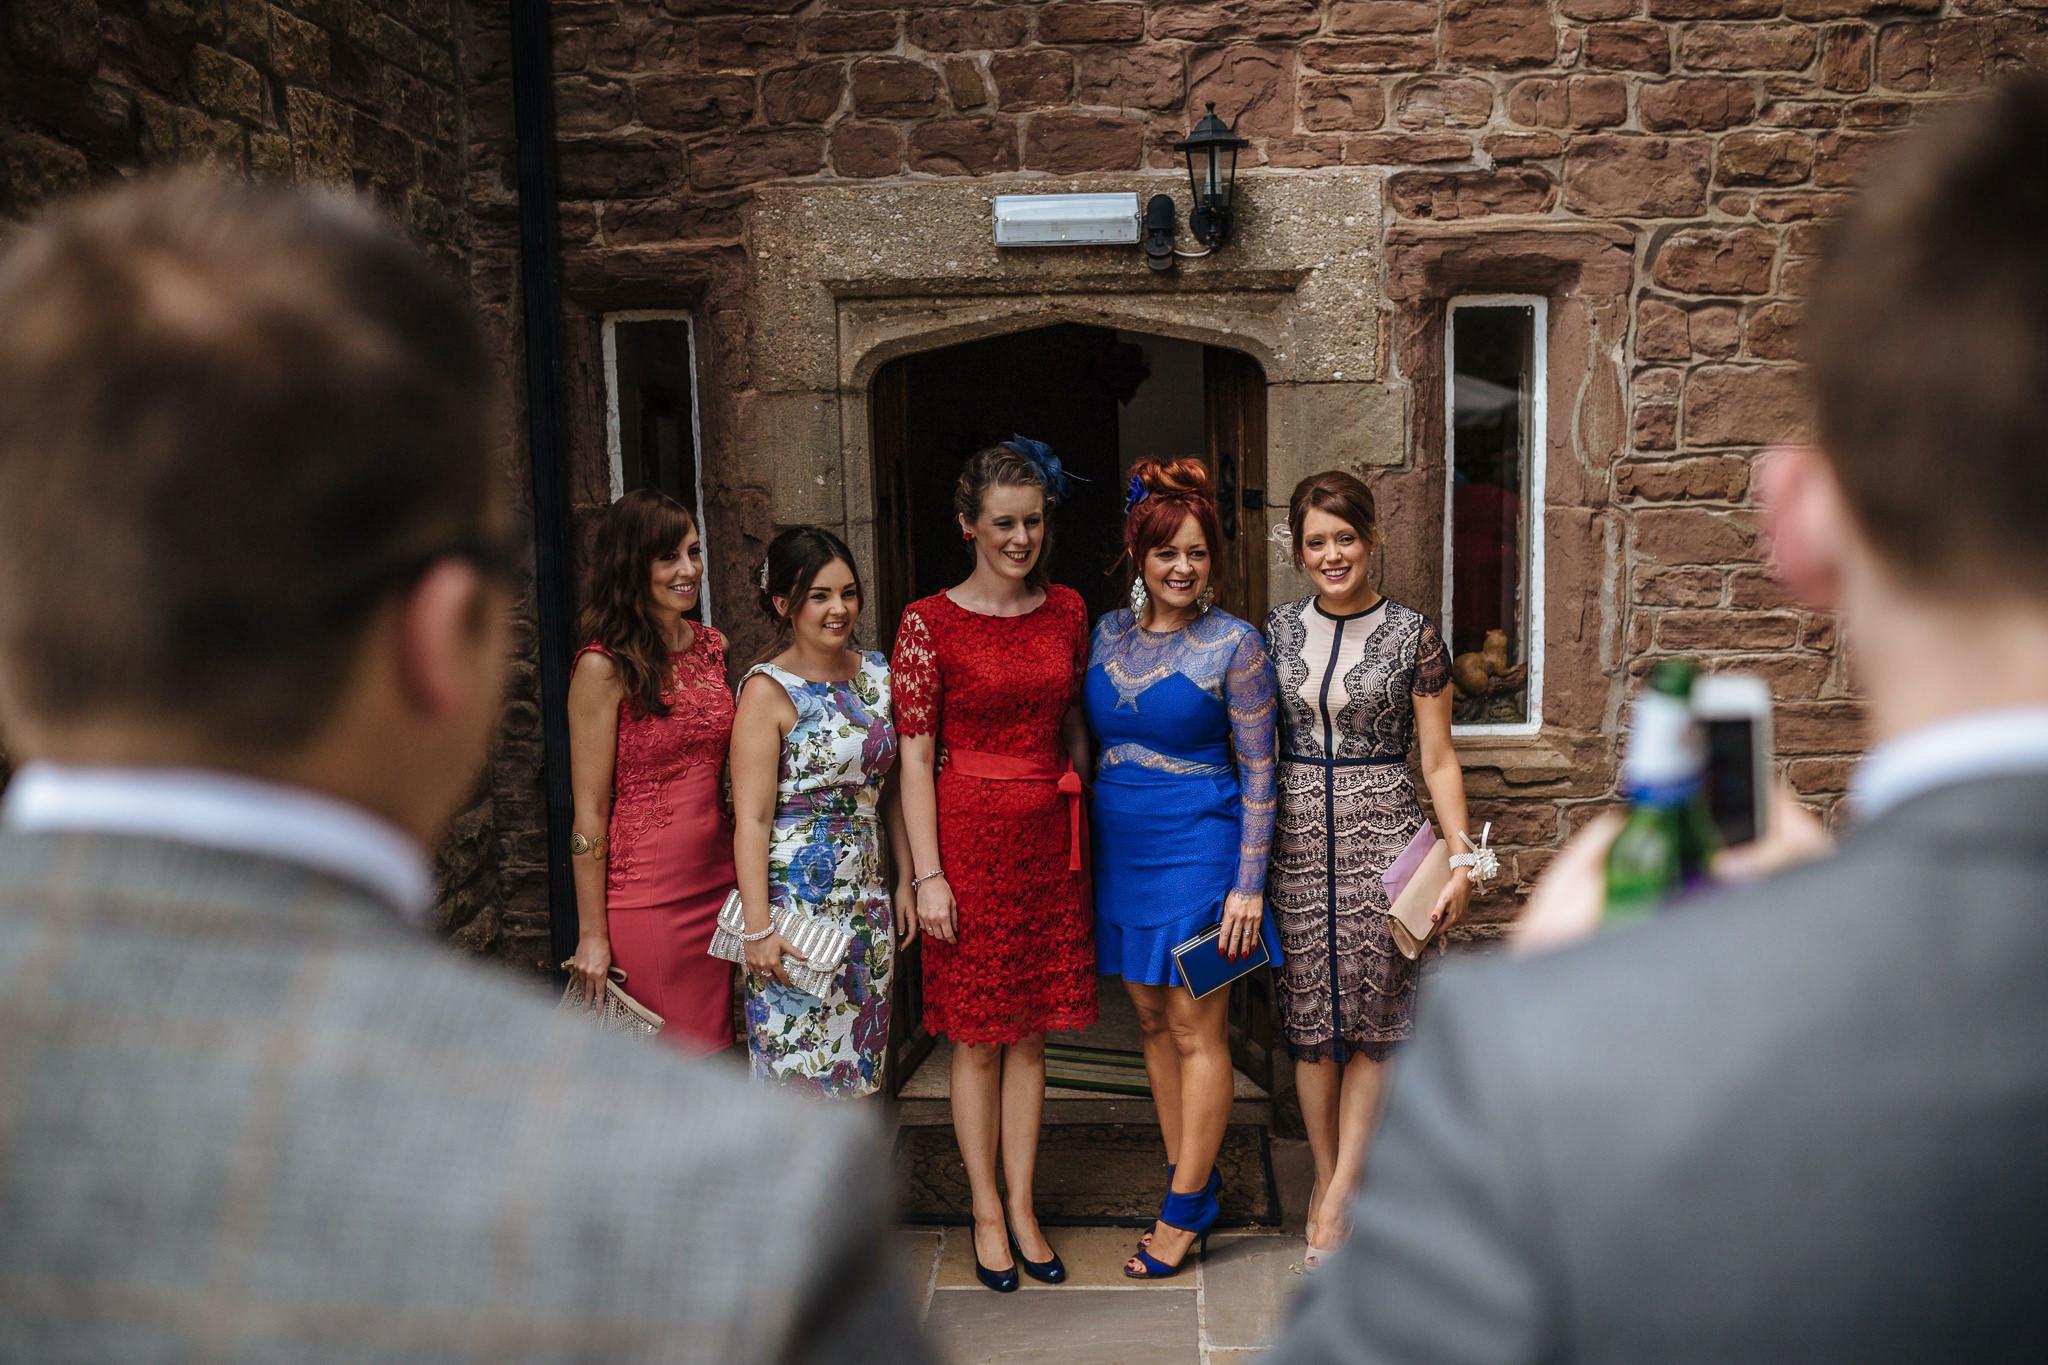 paul-marbrook-Caer-Llan-Wedding-Photographer-90034